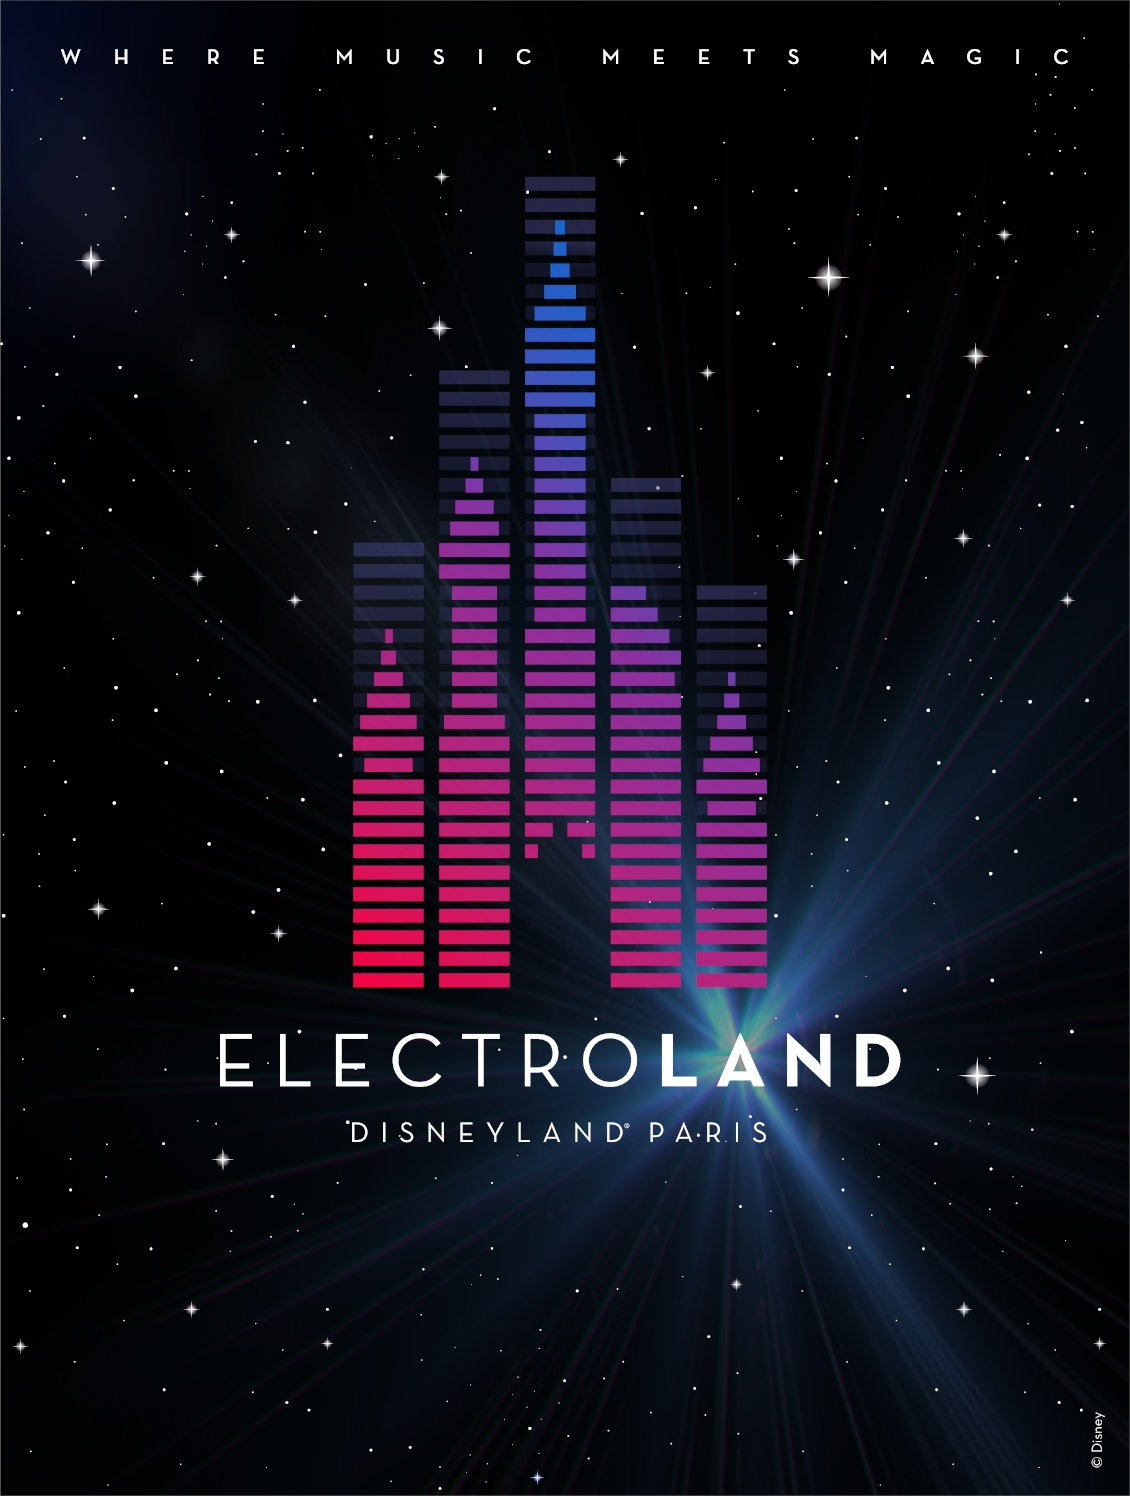 Disneyland Paris - Electroland 2019